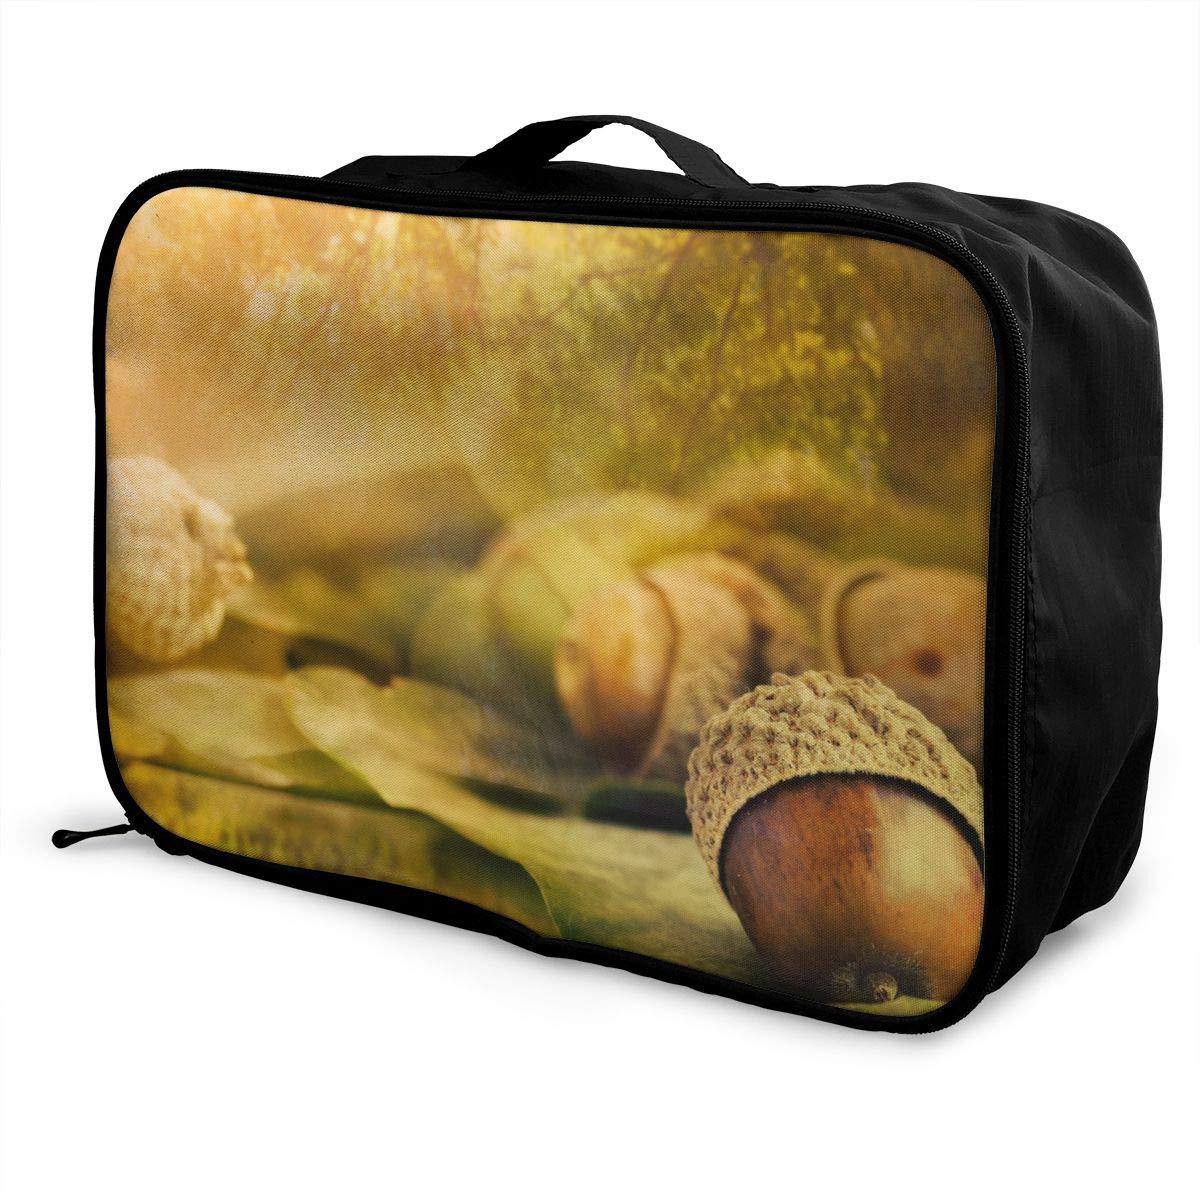 Travel Luggage Duffle Bag Lightweight Portable Handbag Nuts Large Capacity Waterproof Foldable Storage Tote